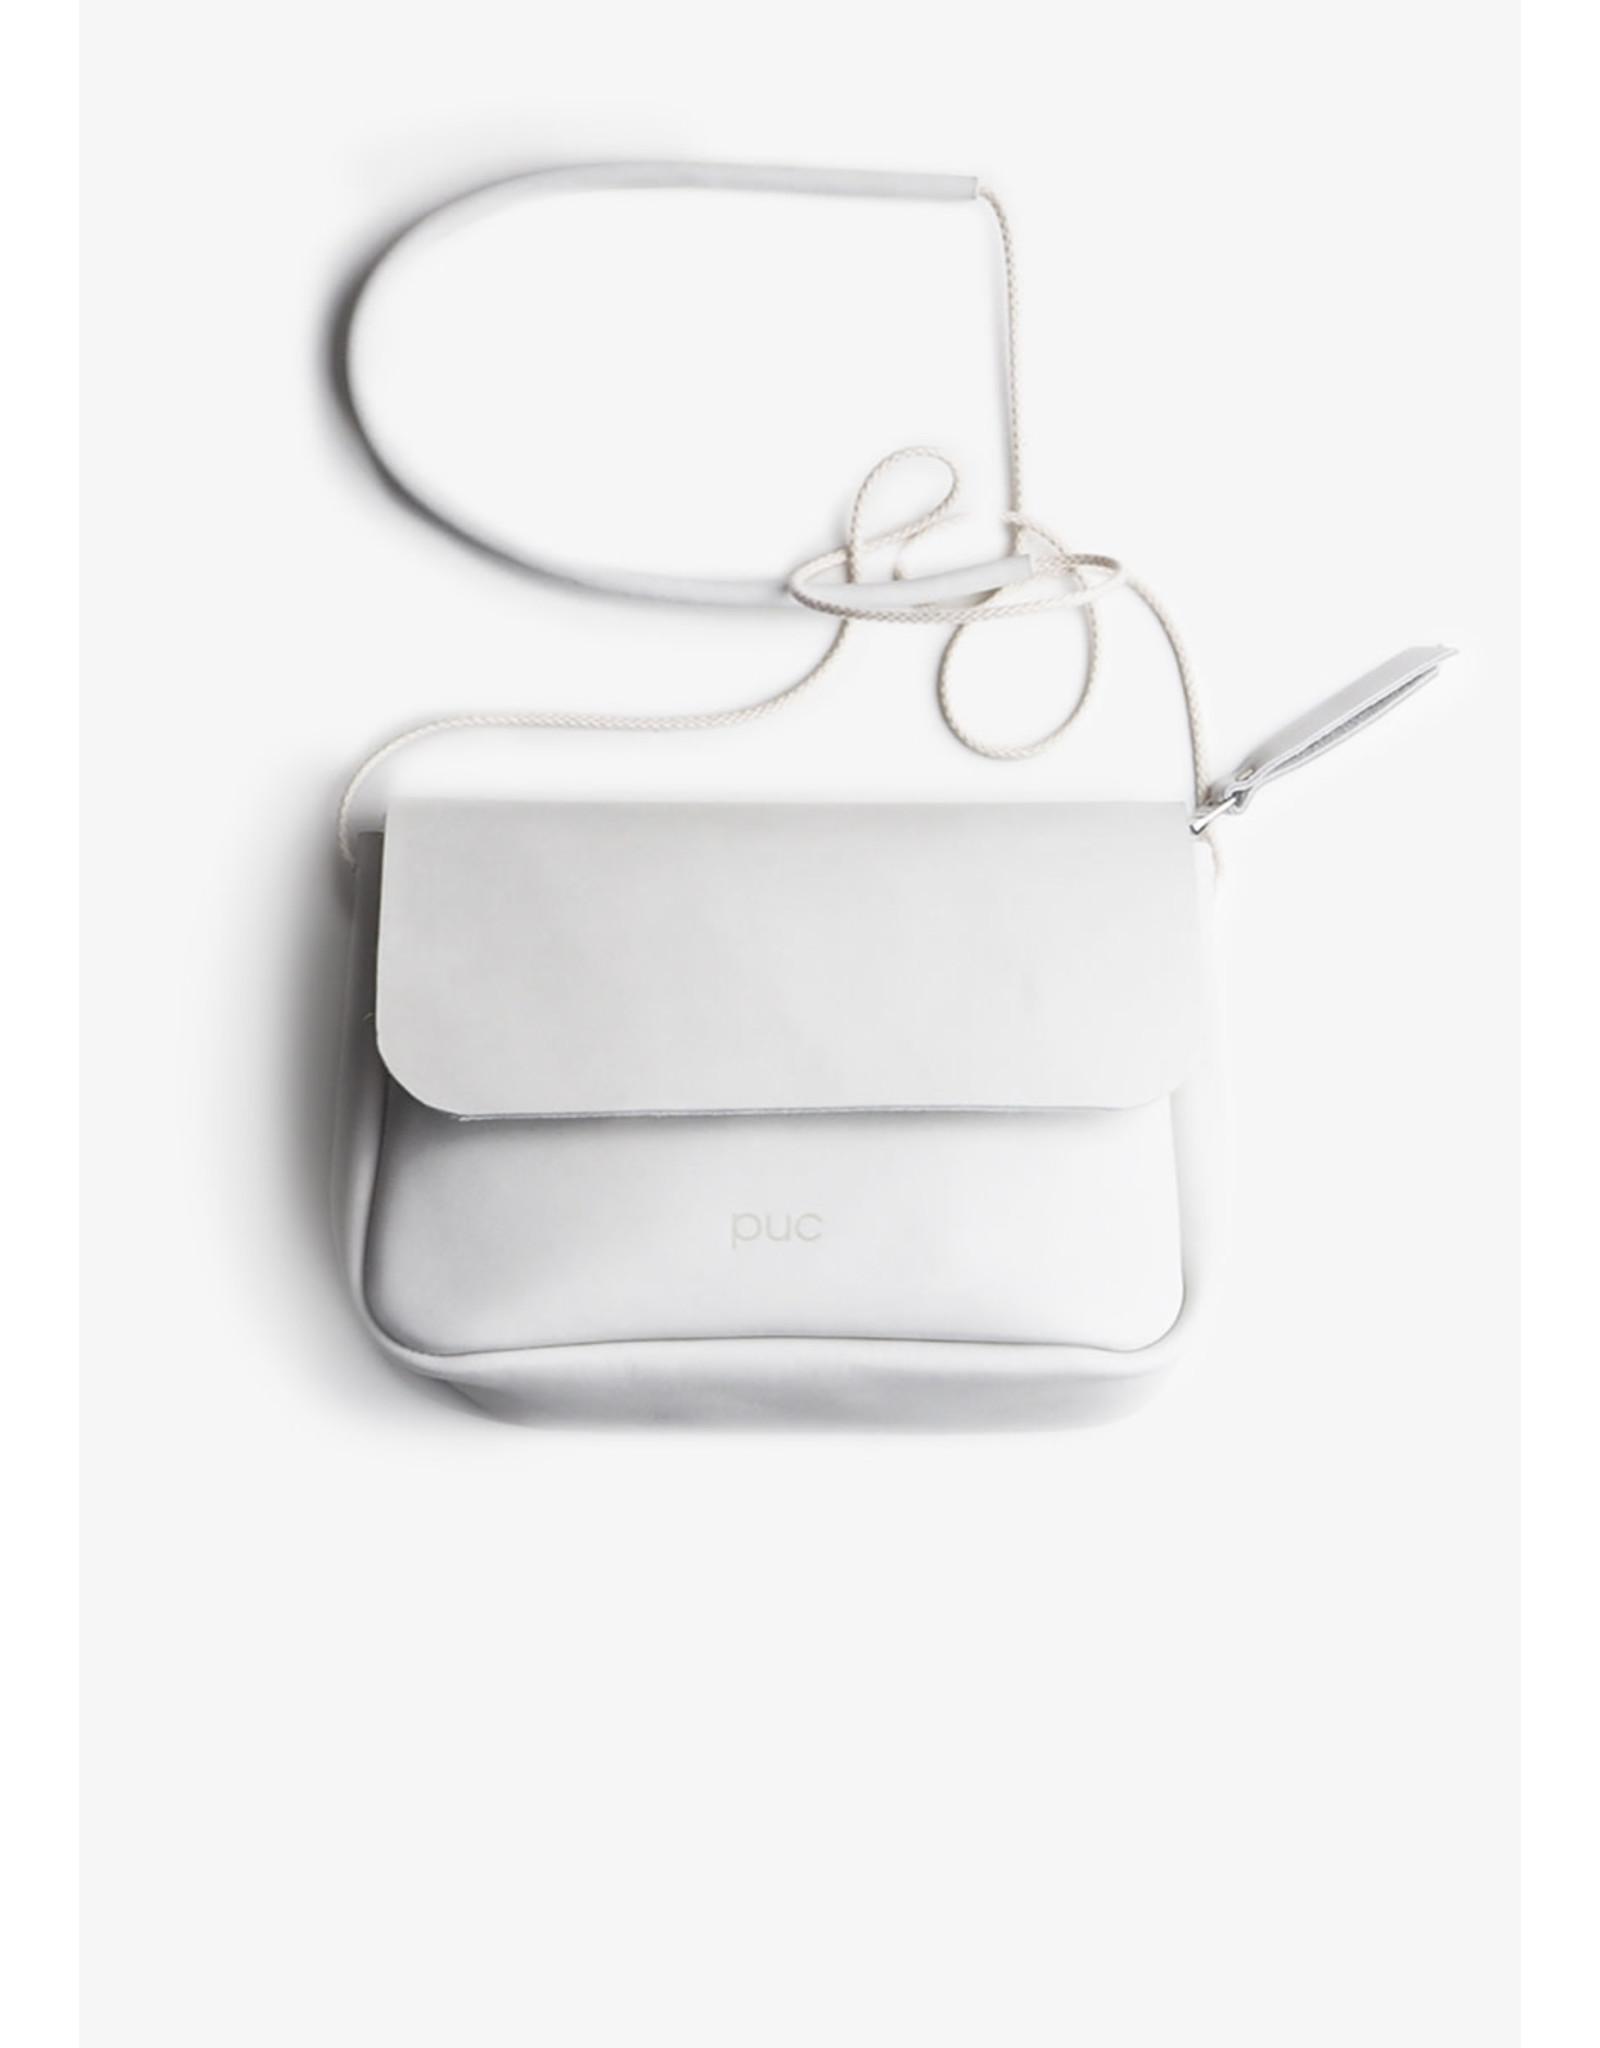 Puc City Trip | S | Off White |  synthetisch strap (super stevig!) sluiting: rits materiaal: rundleer // formaat: 20 x 15 x 8 cm